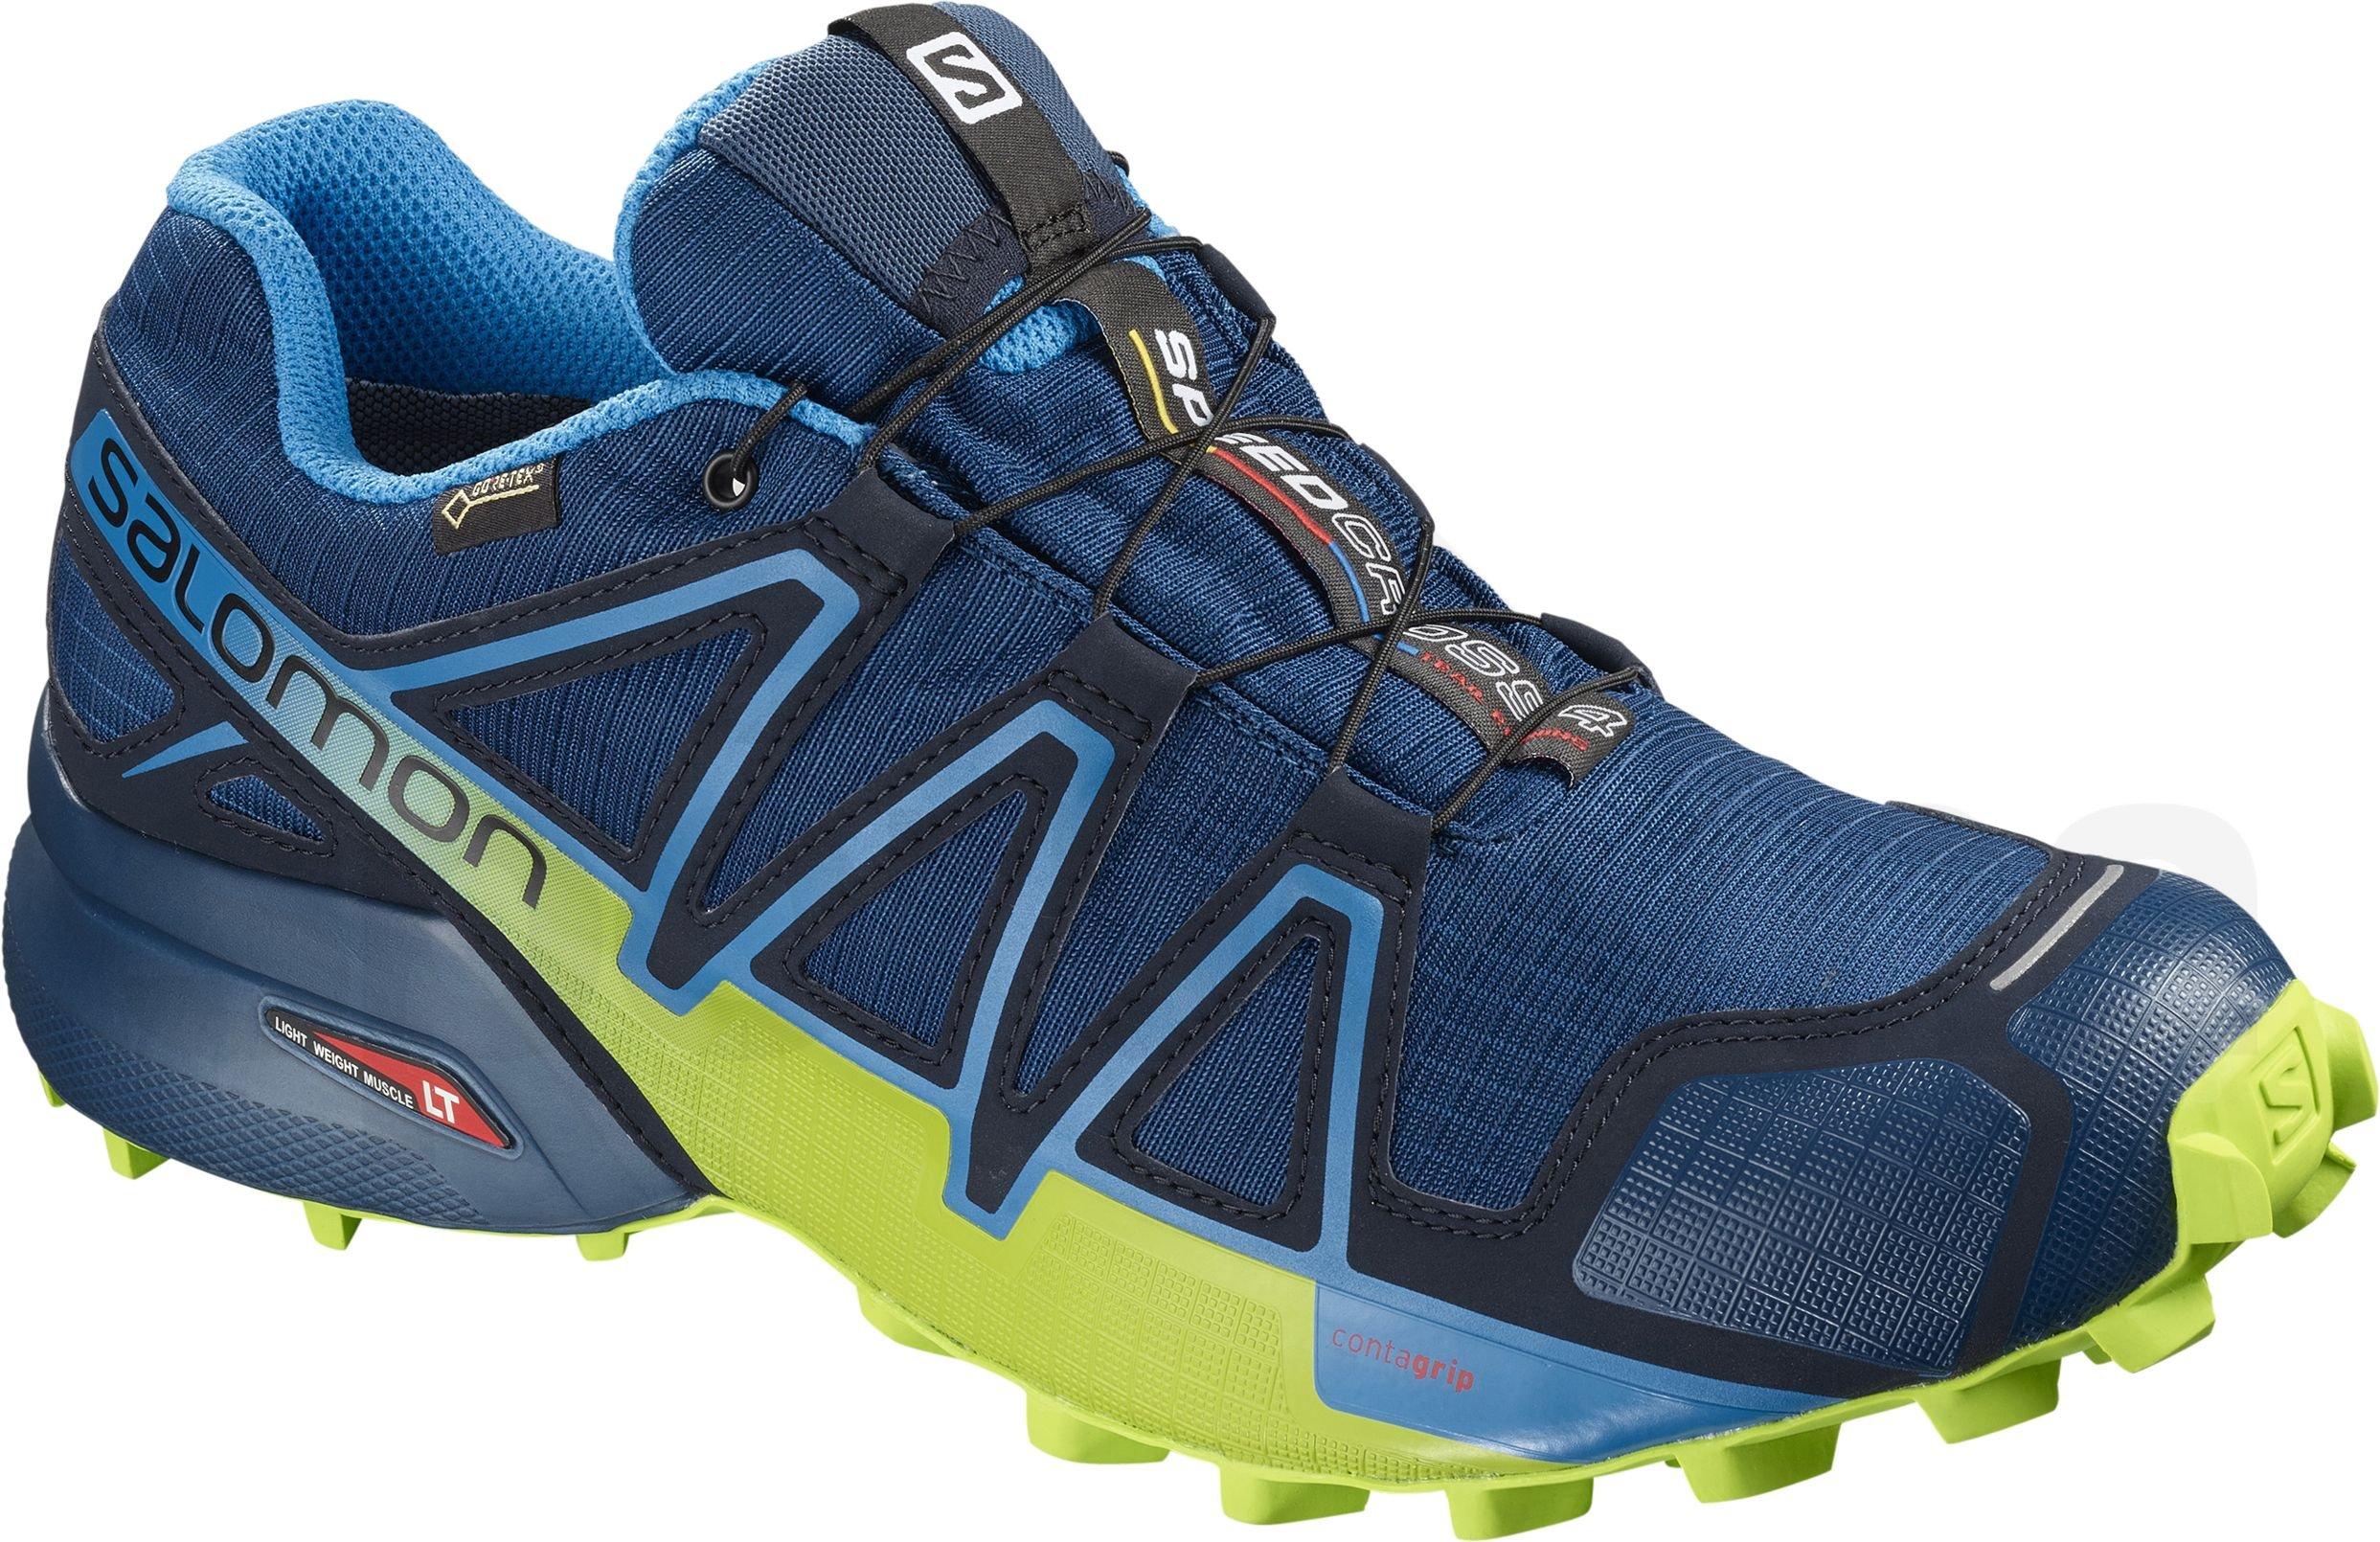 9bd8ba5075c Pánská trailová běžecká obuv Salomon SENSE RIDE 2 Blue orange ...